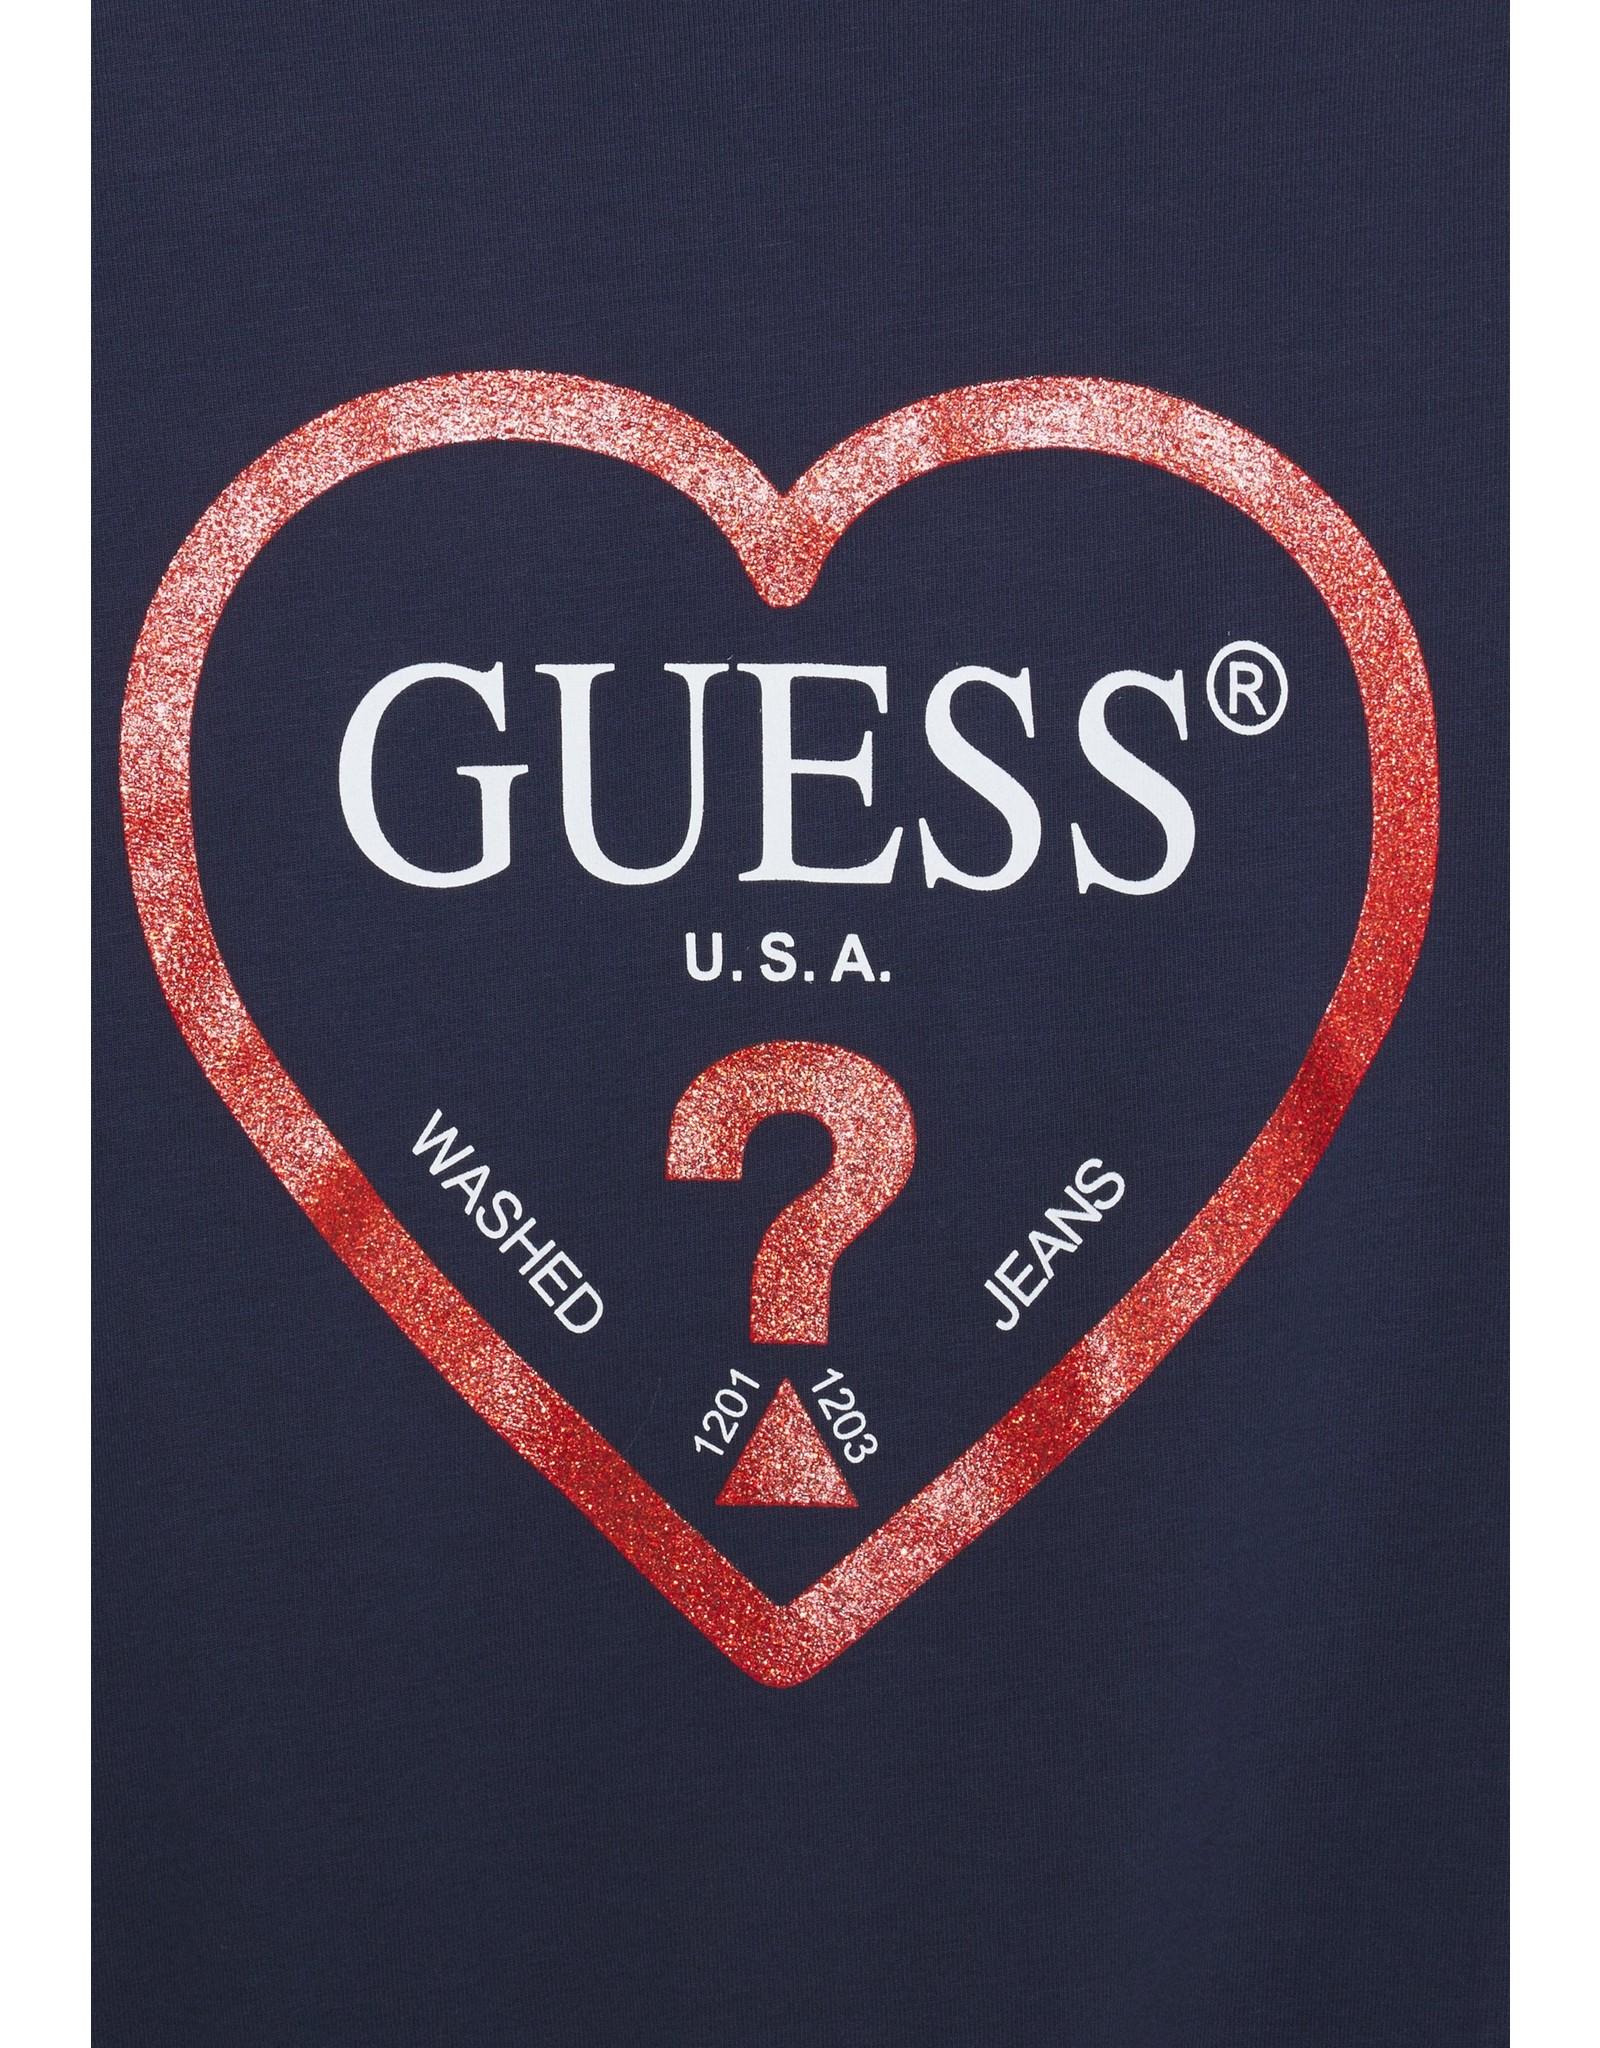 Guess Longsleeve Navy Red Heart